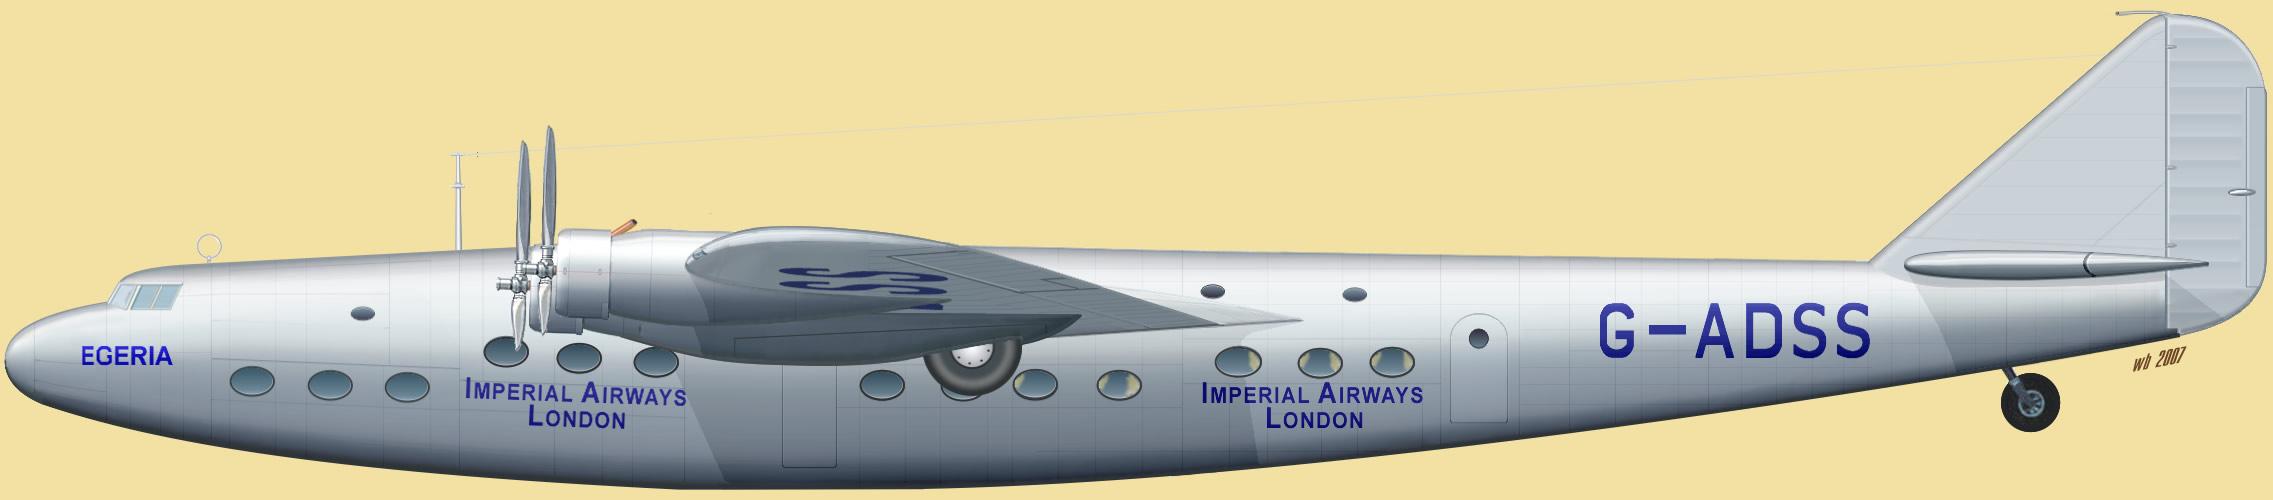 ... imperial airways g adss egeria серийный номер aw 115